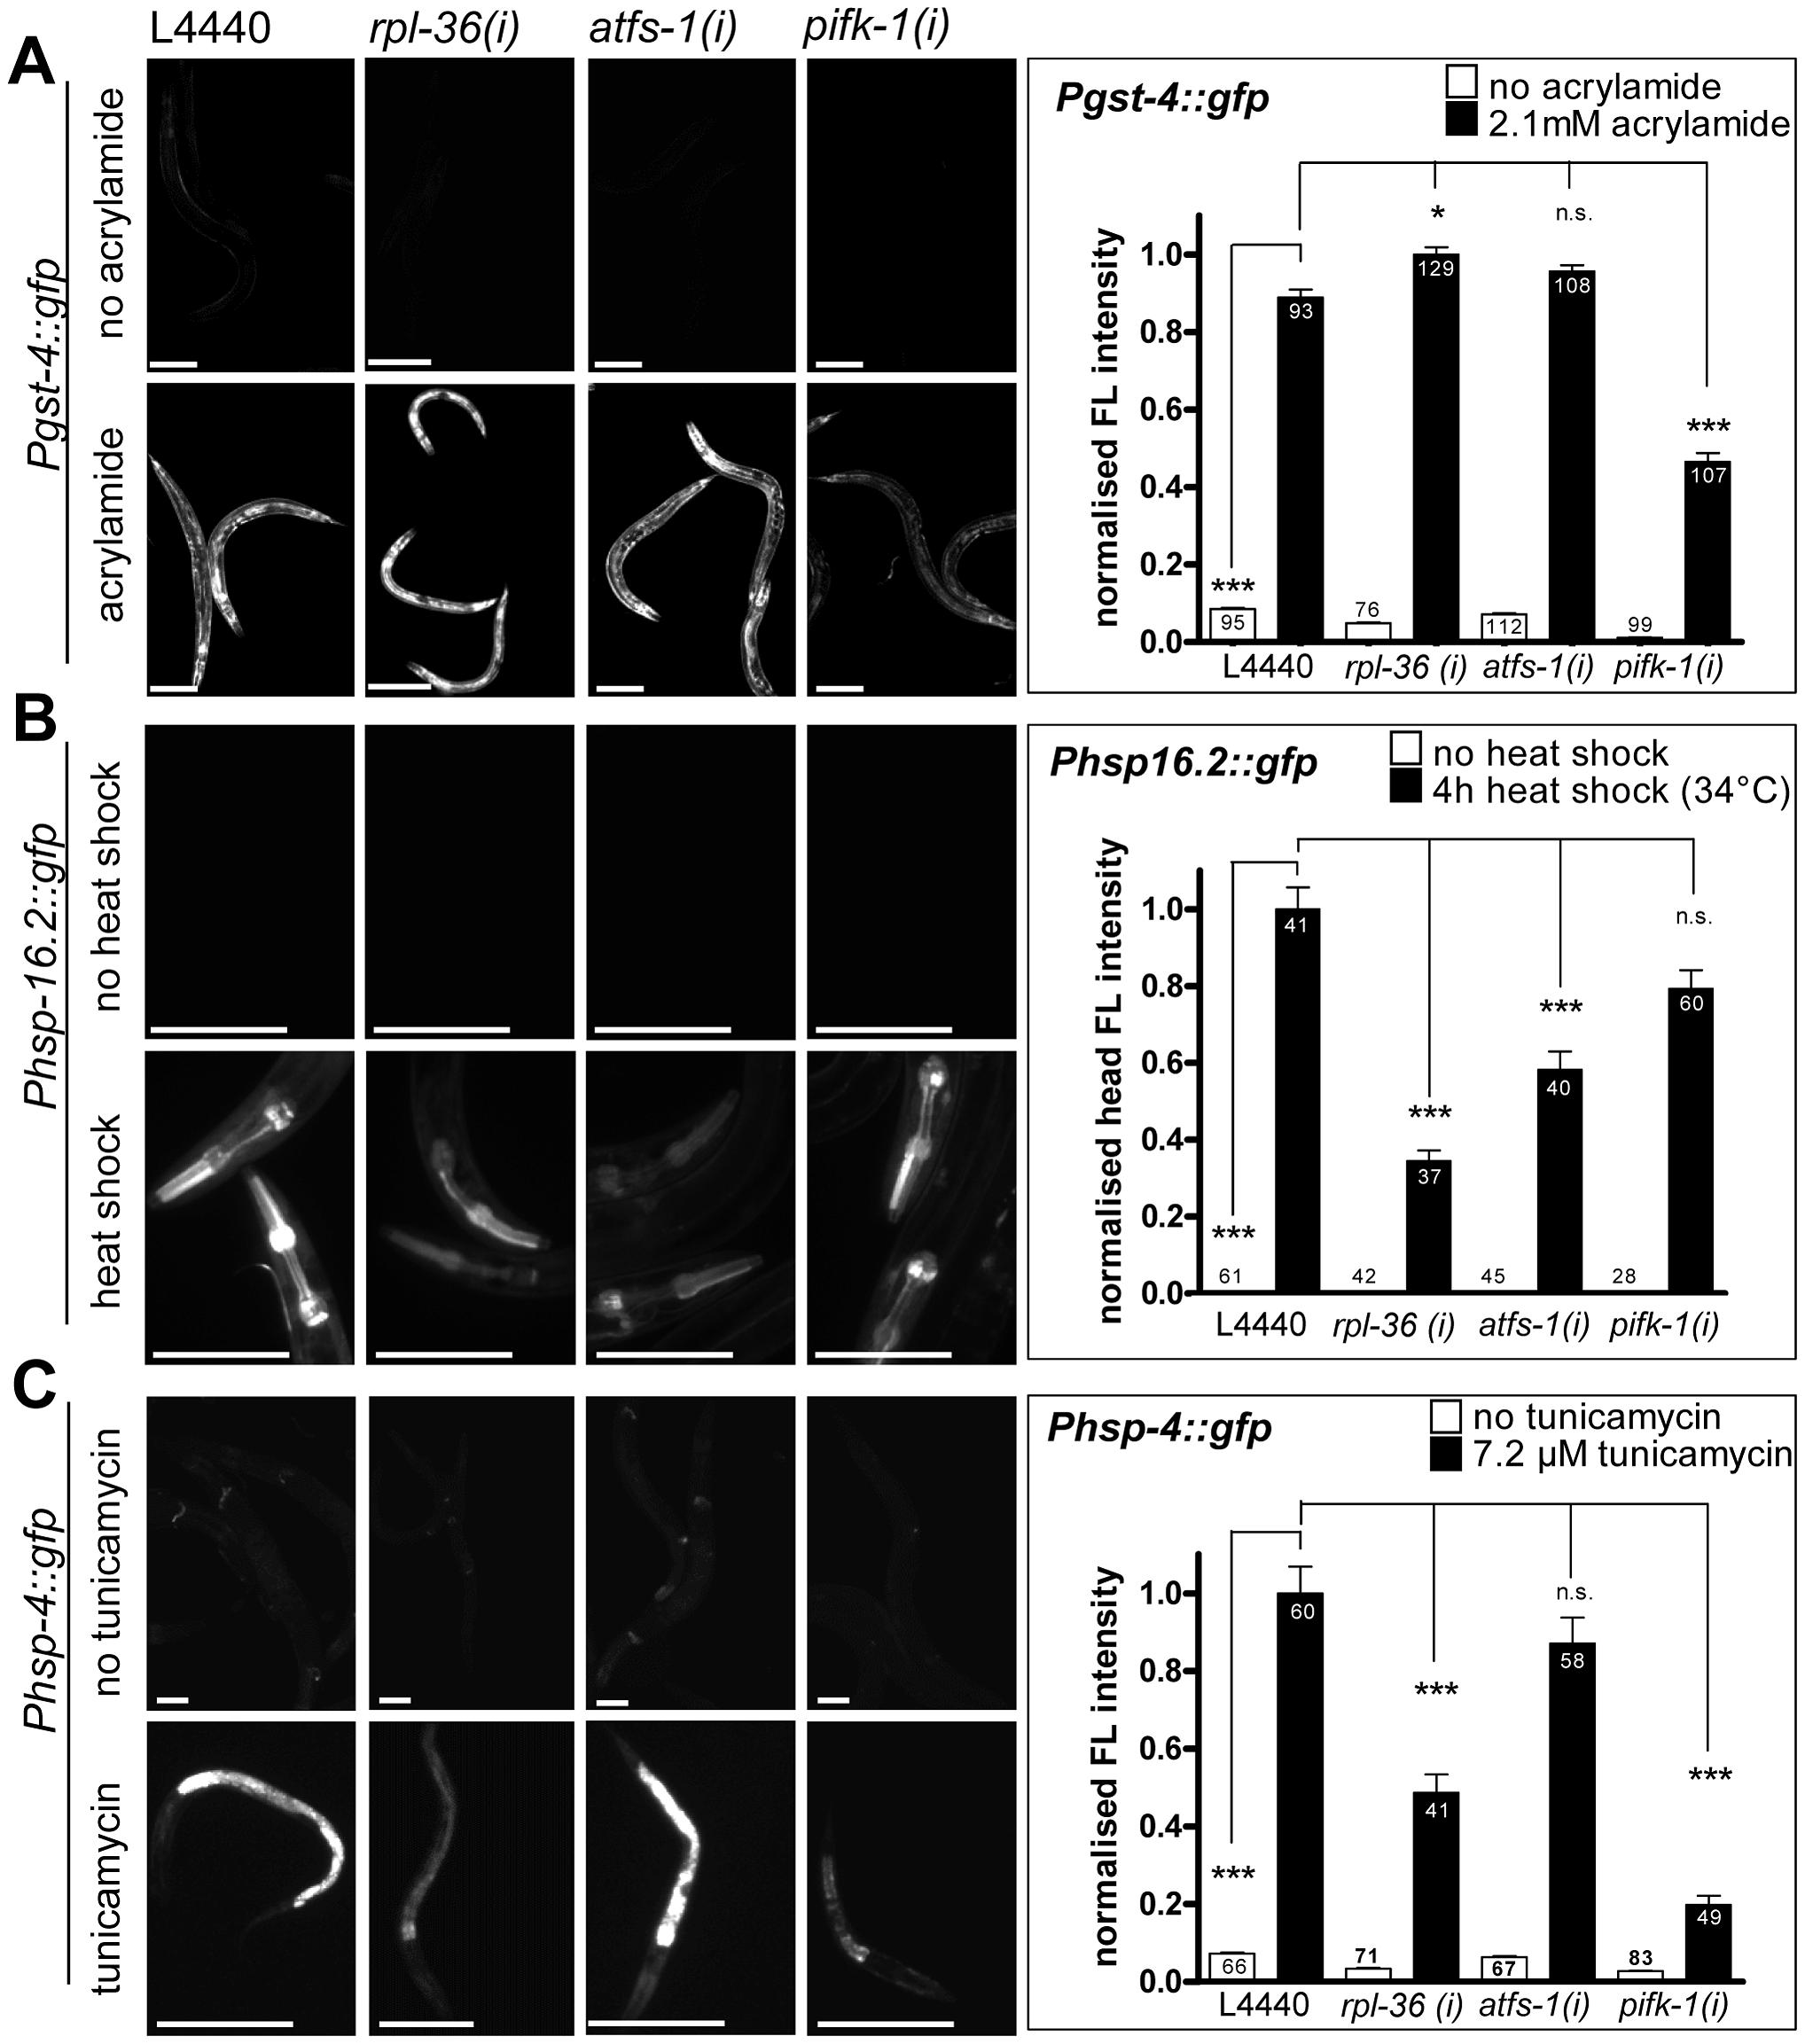 The knockdown of <i>rpl-36</i>, <i>atfs-1</i>, or <i>pifk-1</i> does not prevent non-mitochondrial stress responses.